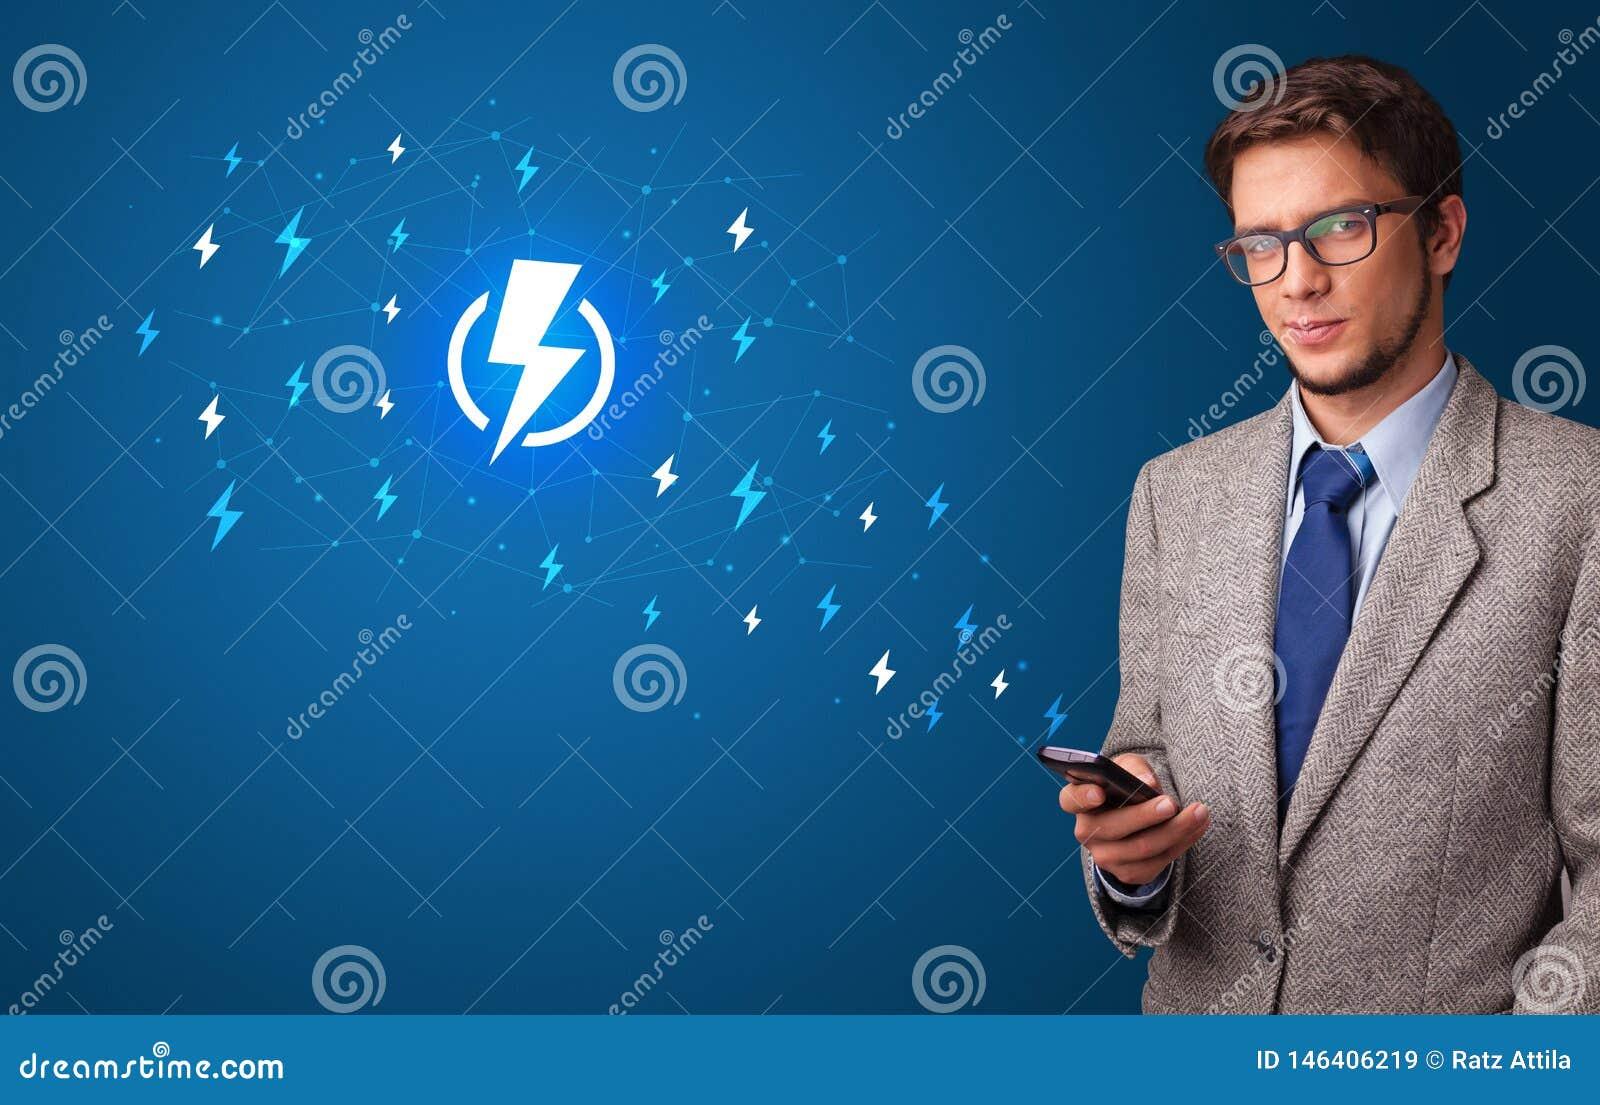 Persoon die telefoon met machtsconcept met behulp van